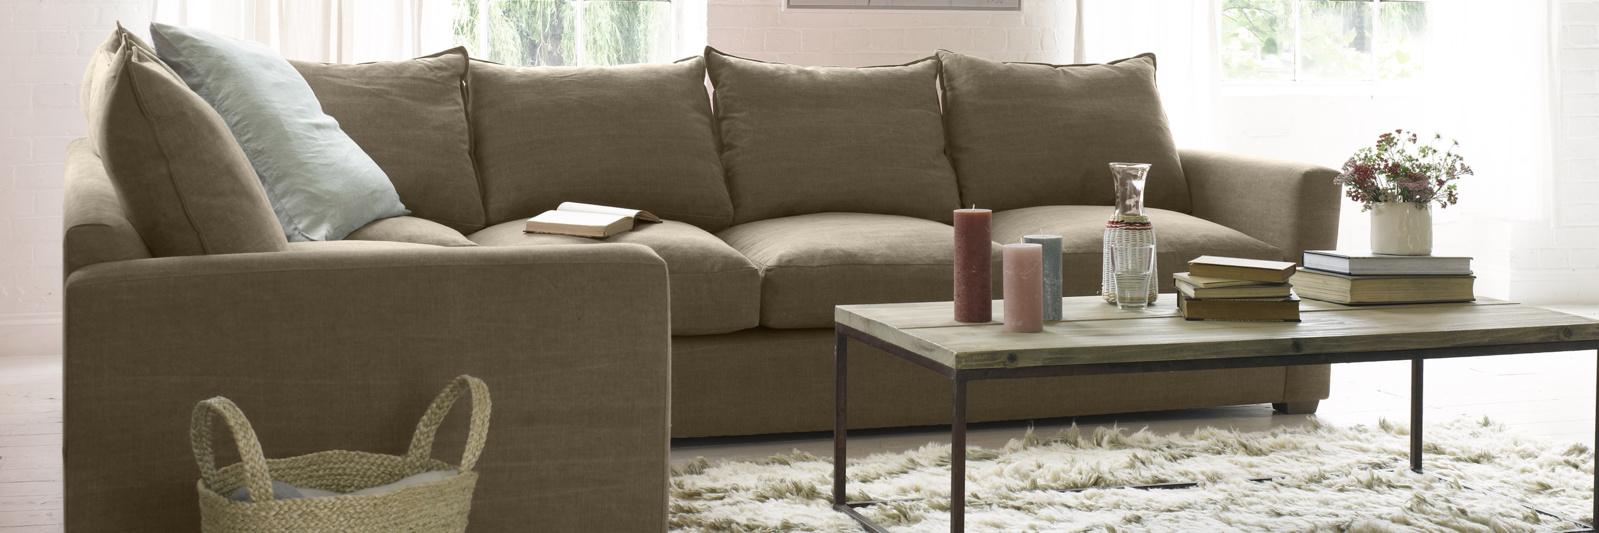 Pavilion corner sofa in brown fabric